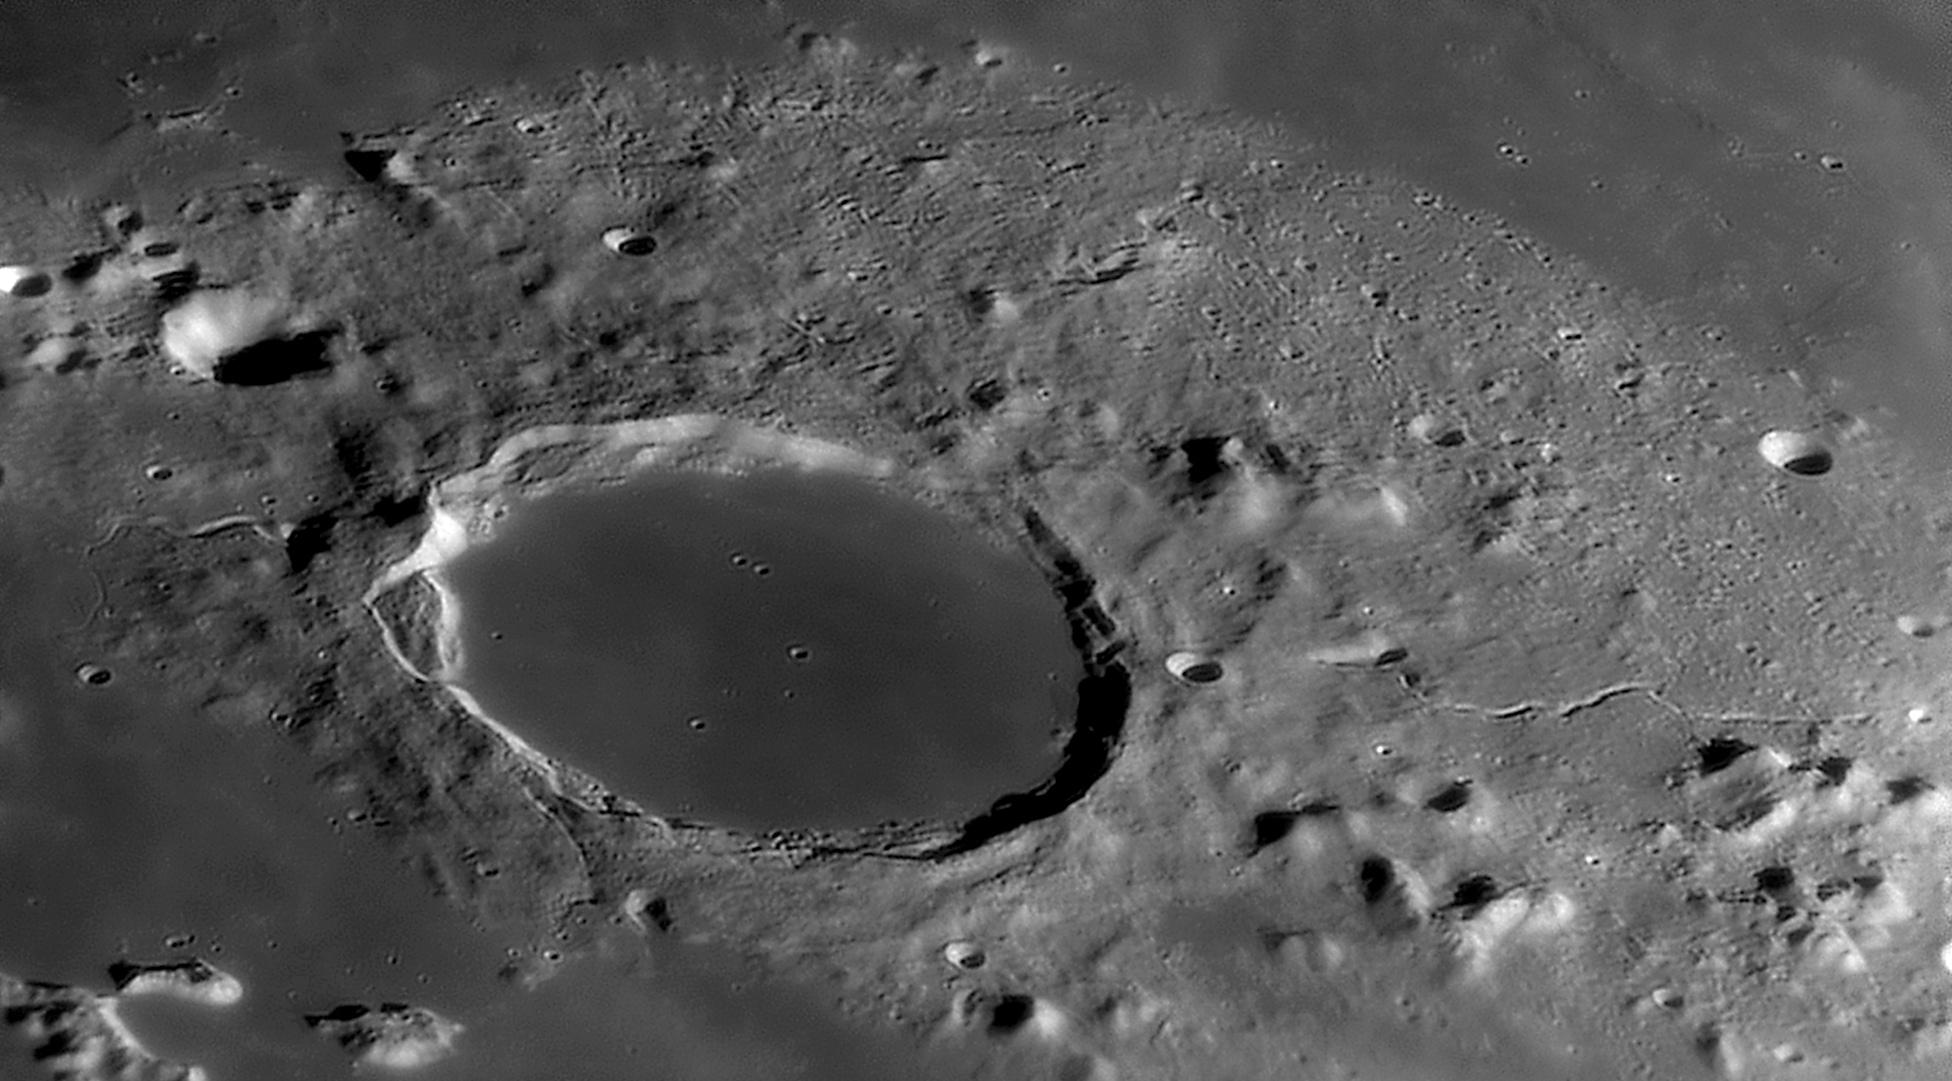 large.moon_CAS-03_04_2020_PLATON.jpg.1a57bfe26b24b6893f38903b9945ff5f.jpg